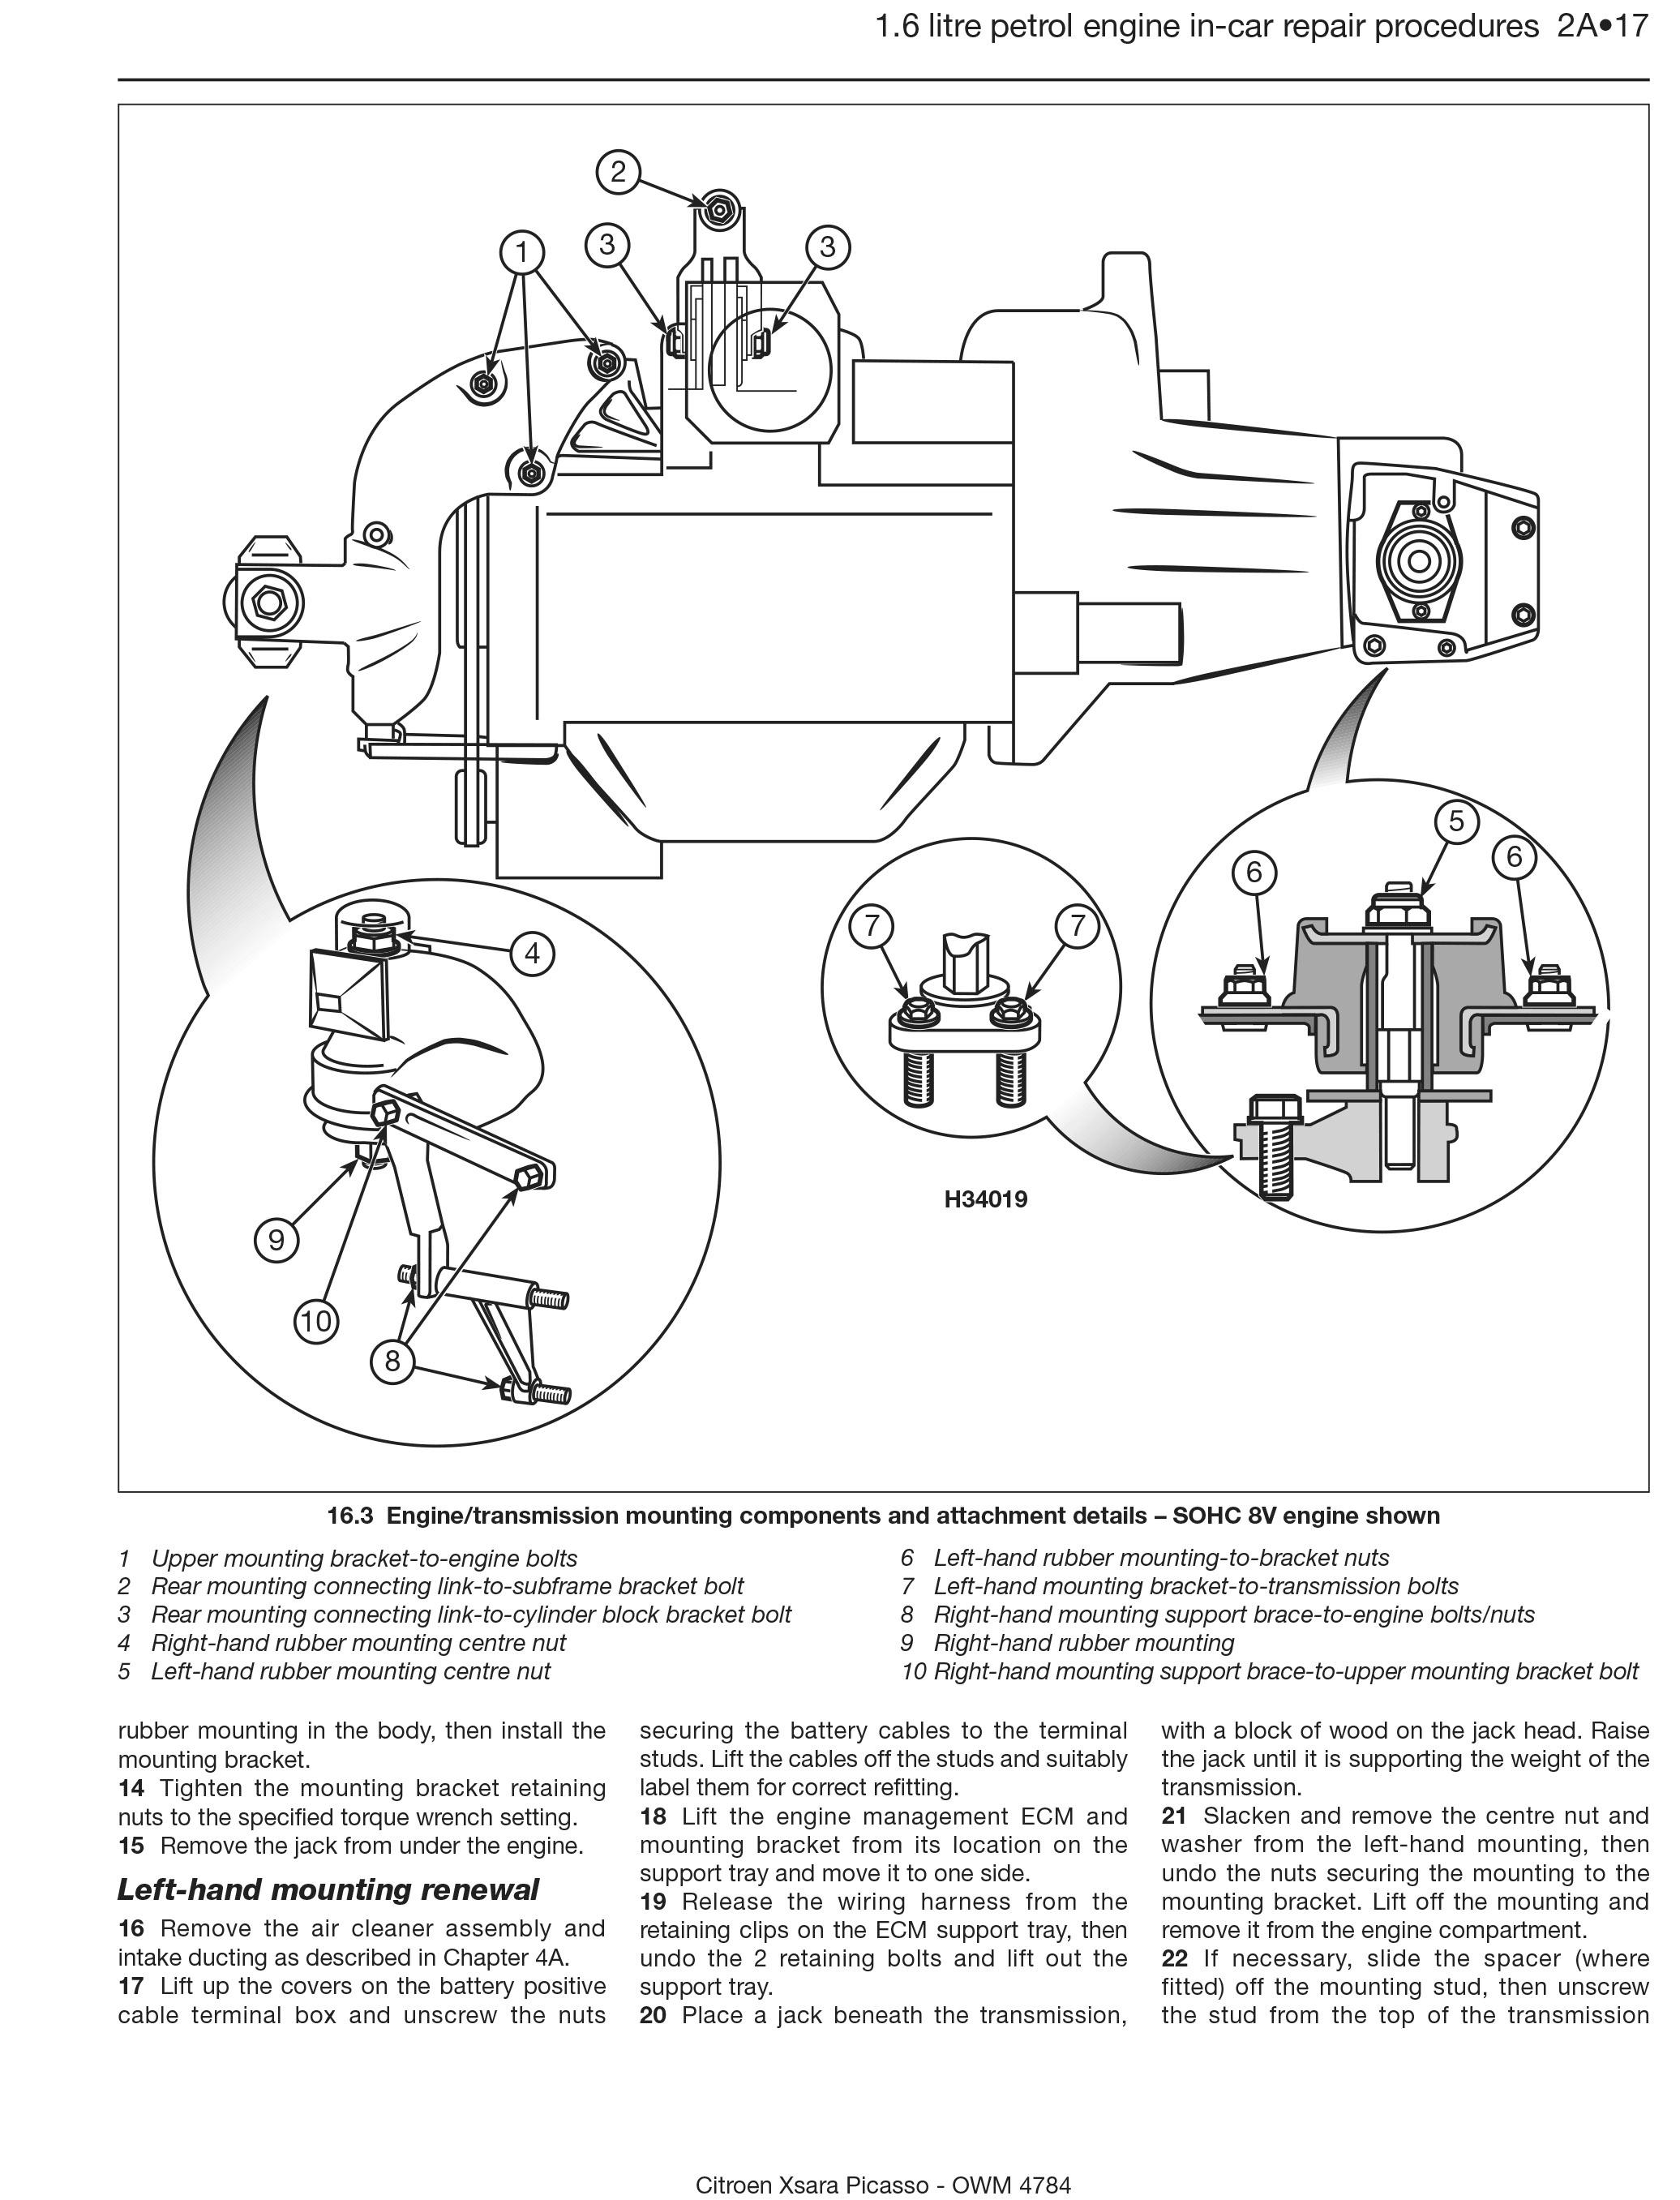 Citroen xsara picasso petrol diesel mar 04 08 haynes repair citroen xsara picasso petrol diesel mar 04 08 haynes repair manual asfbconference2016 Choice Image